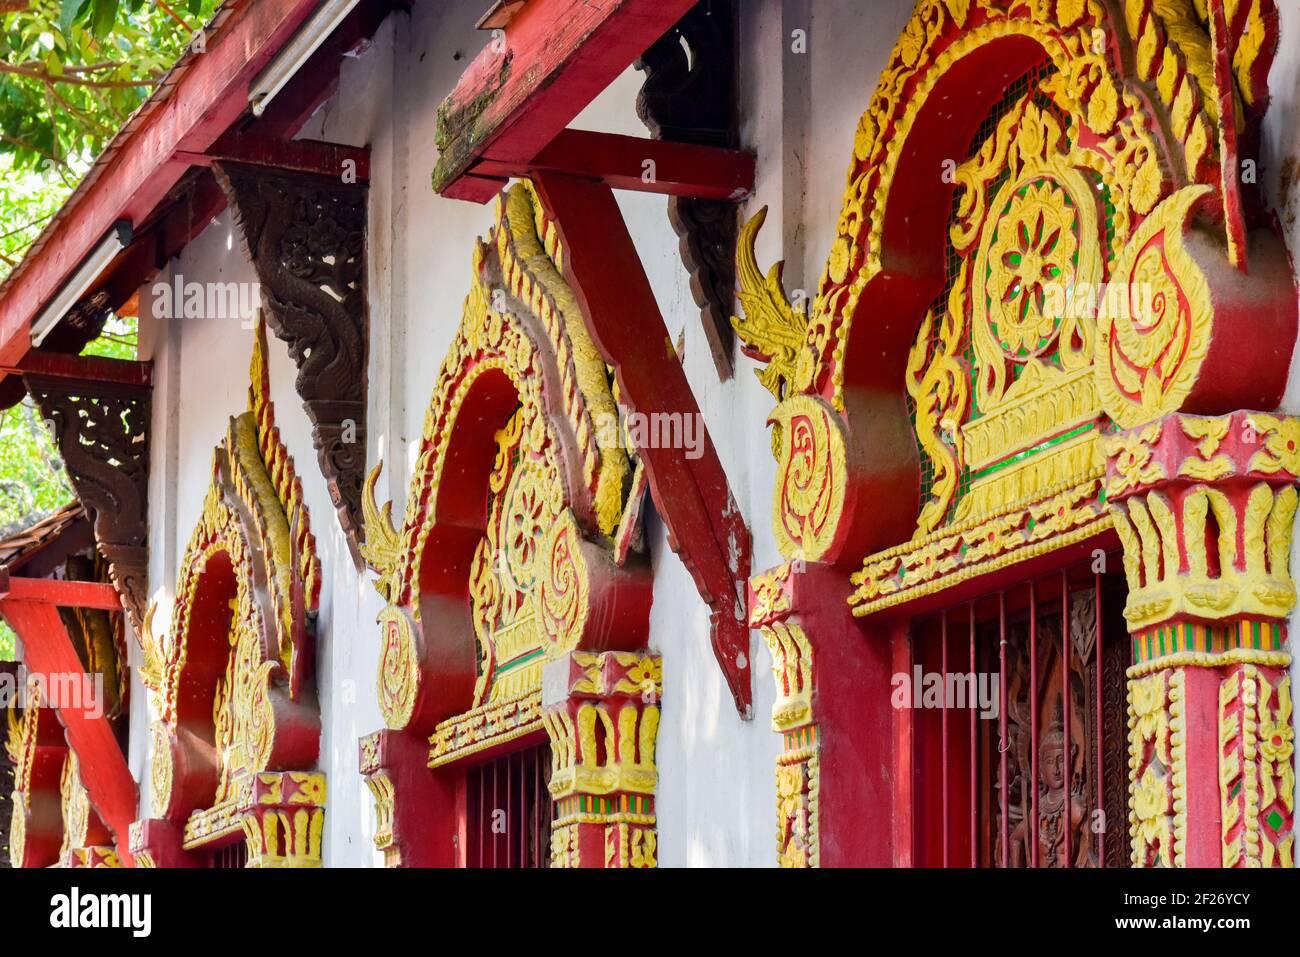 Wat Phra Singh Temple, Chiang Mai, Thailand Stock Photo